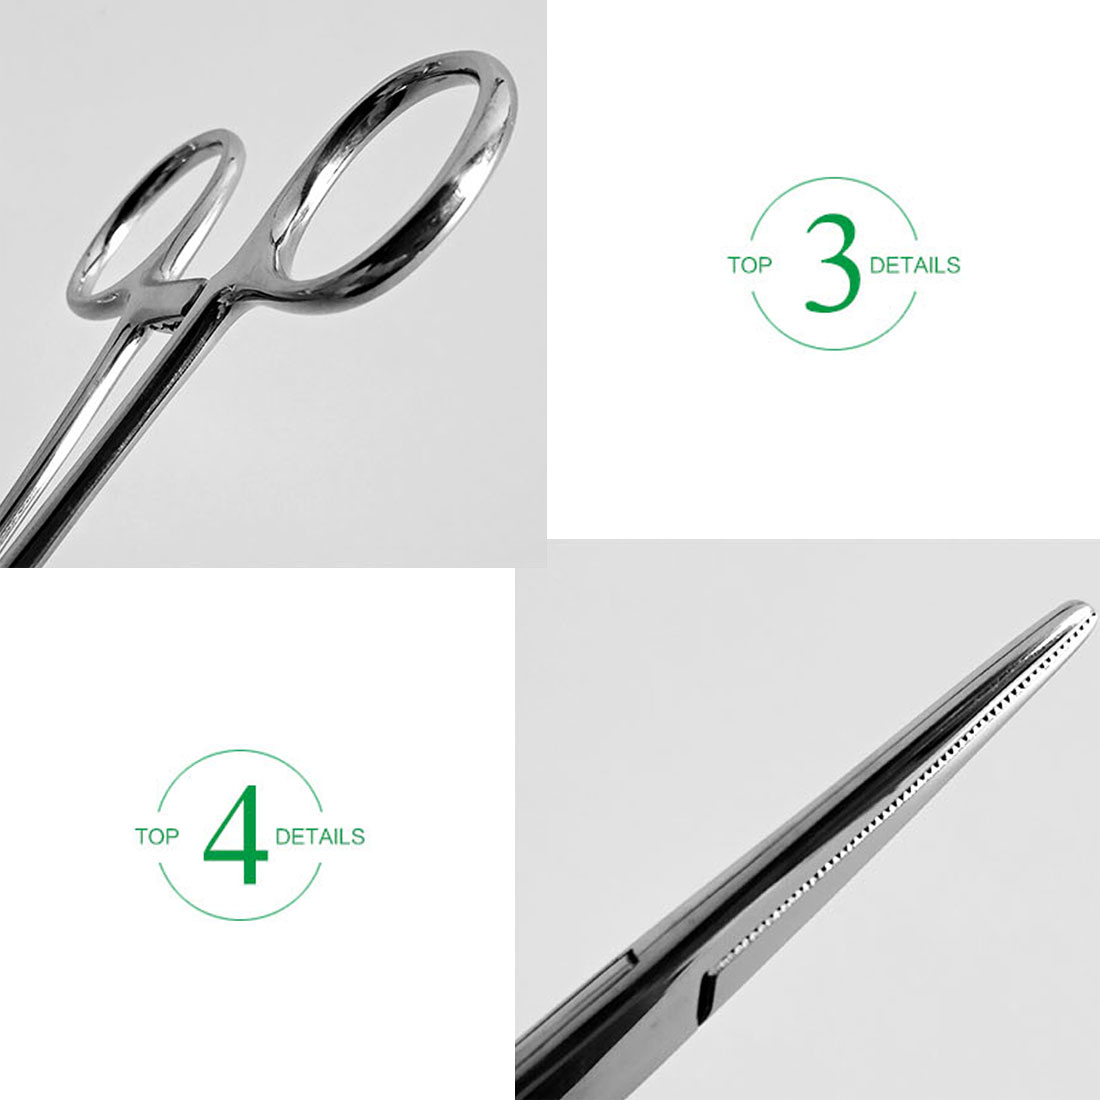 Купить с кэшбэком Stainless Steel Bent-nose/Straight  Fishing Locking Elbow Scissors Pliers Hemostatic Forceps Pet Hair Towel Clamp Pliers